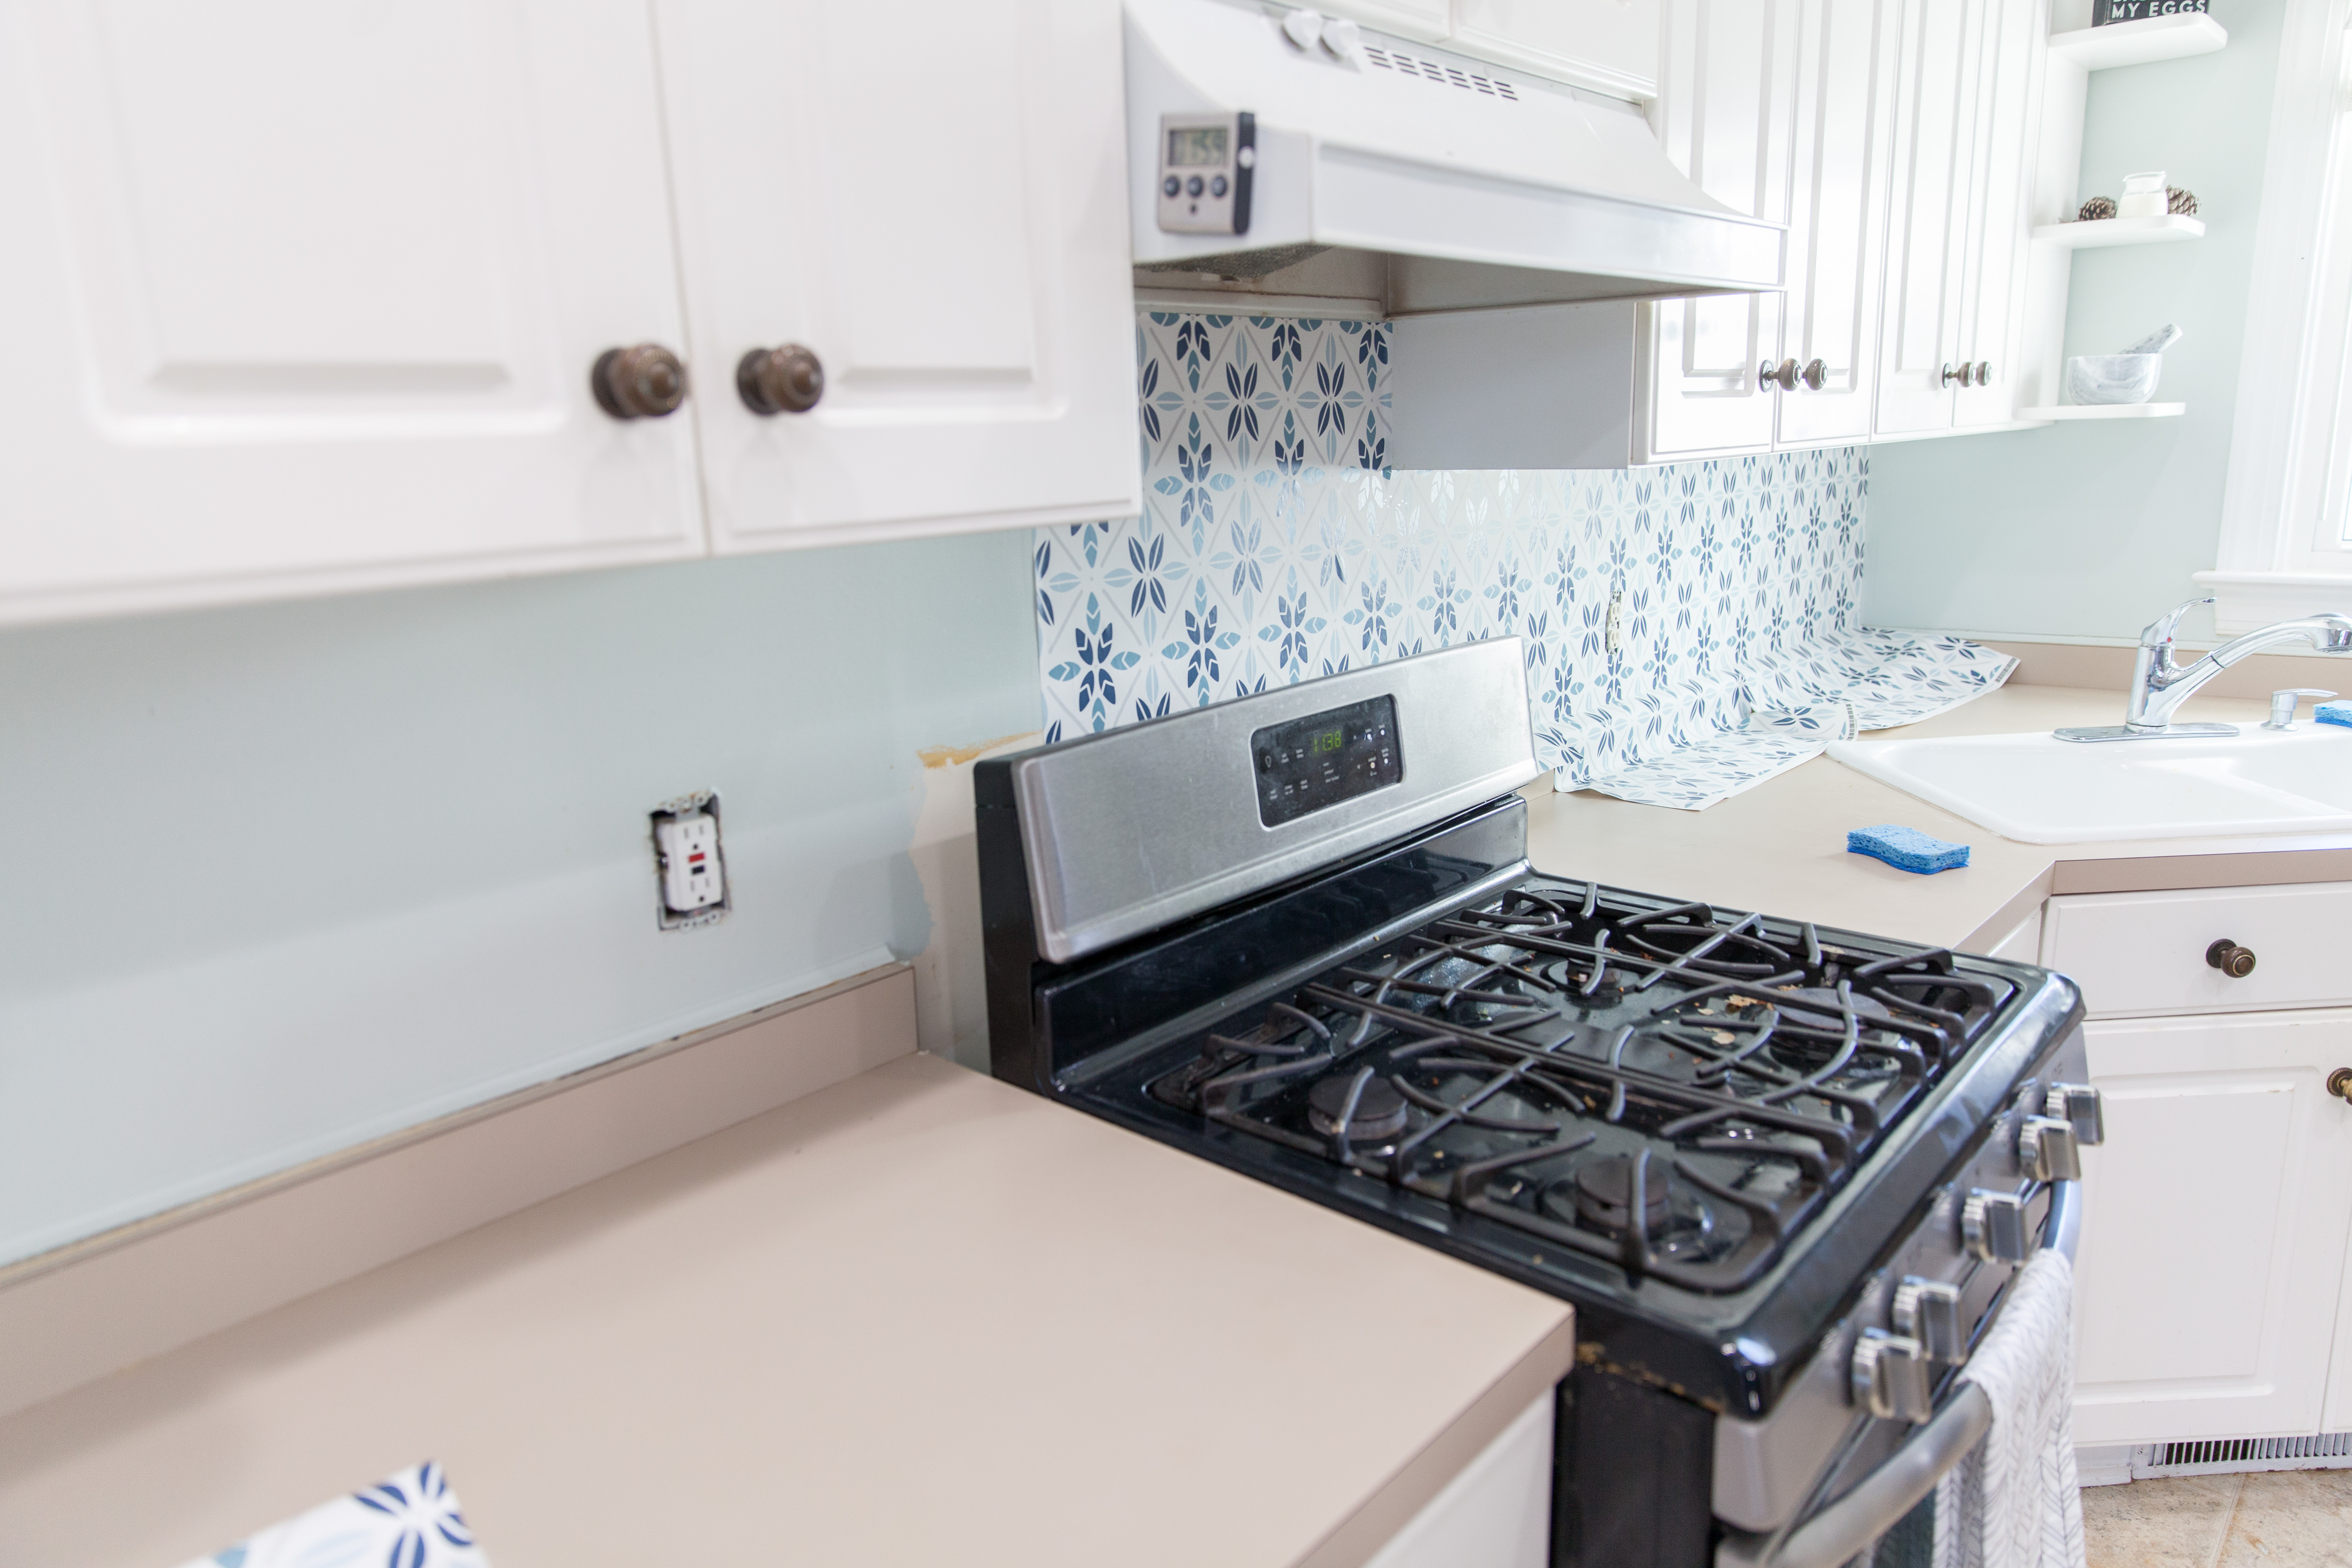 Easy Faux Tile Backsplash with Eco Friendly Wallpaper 5616x3744